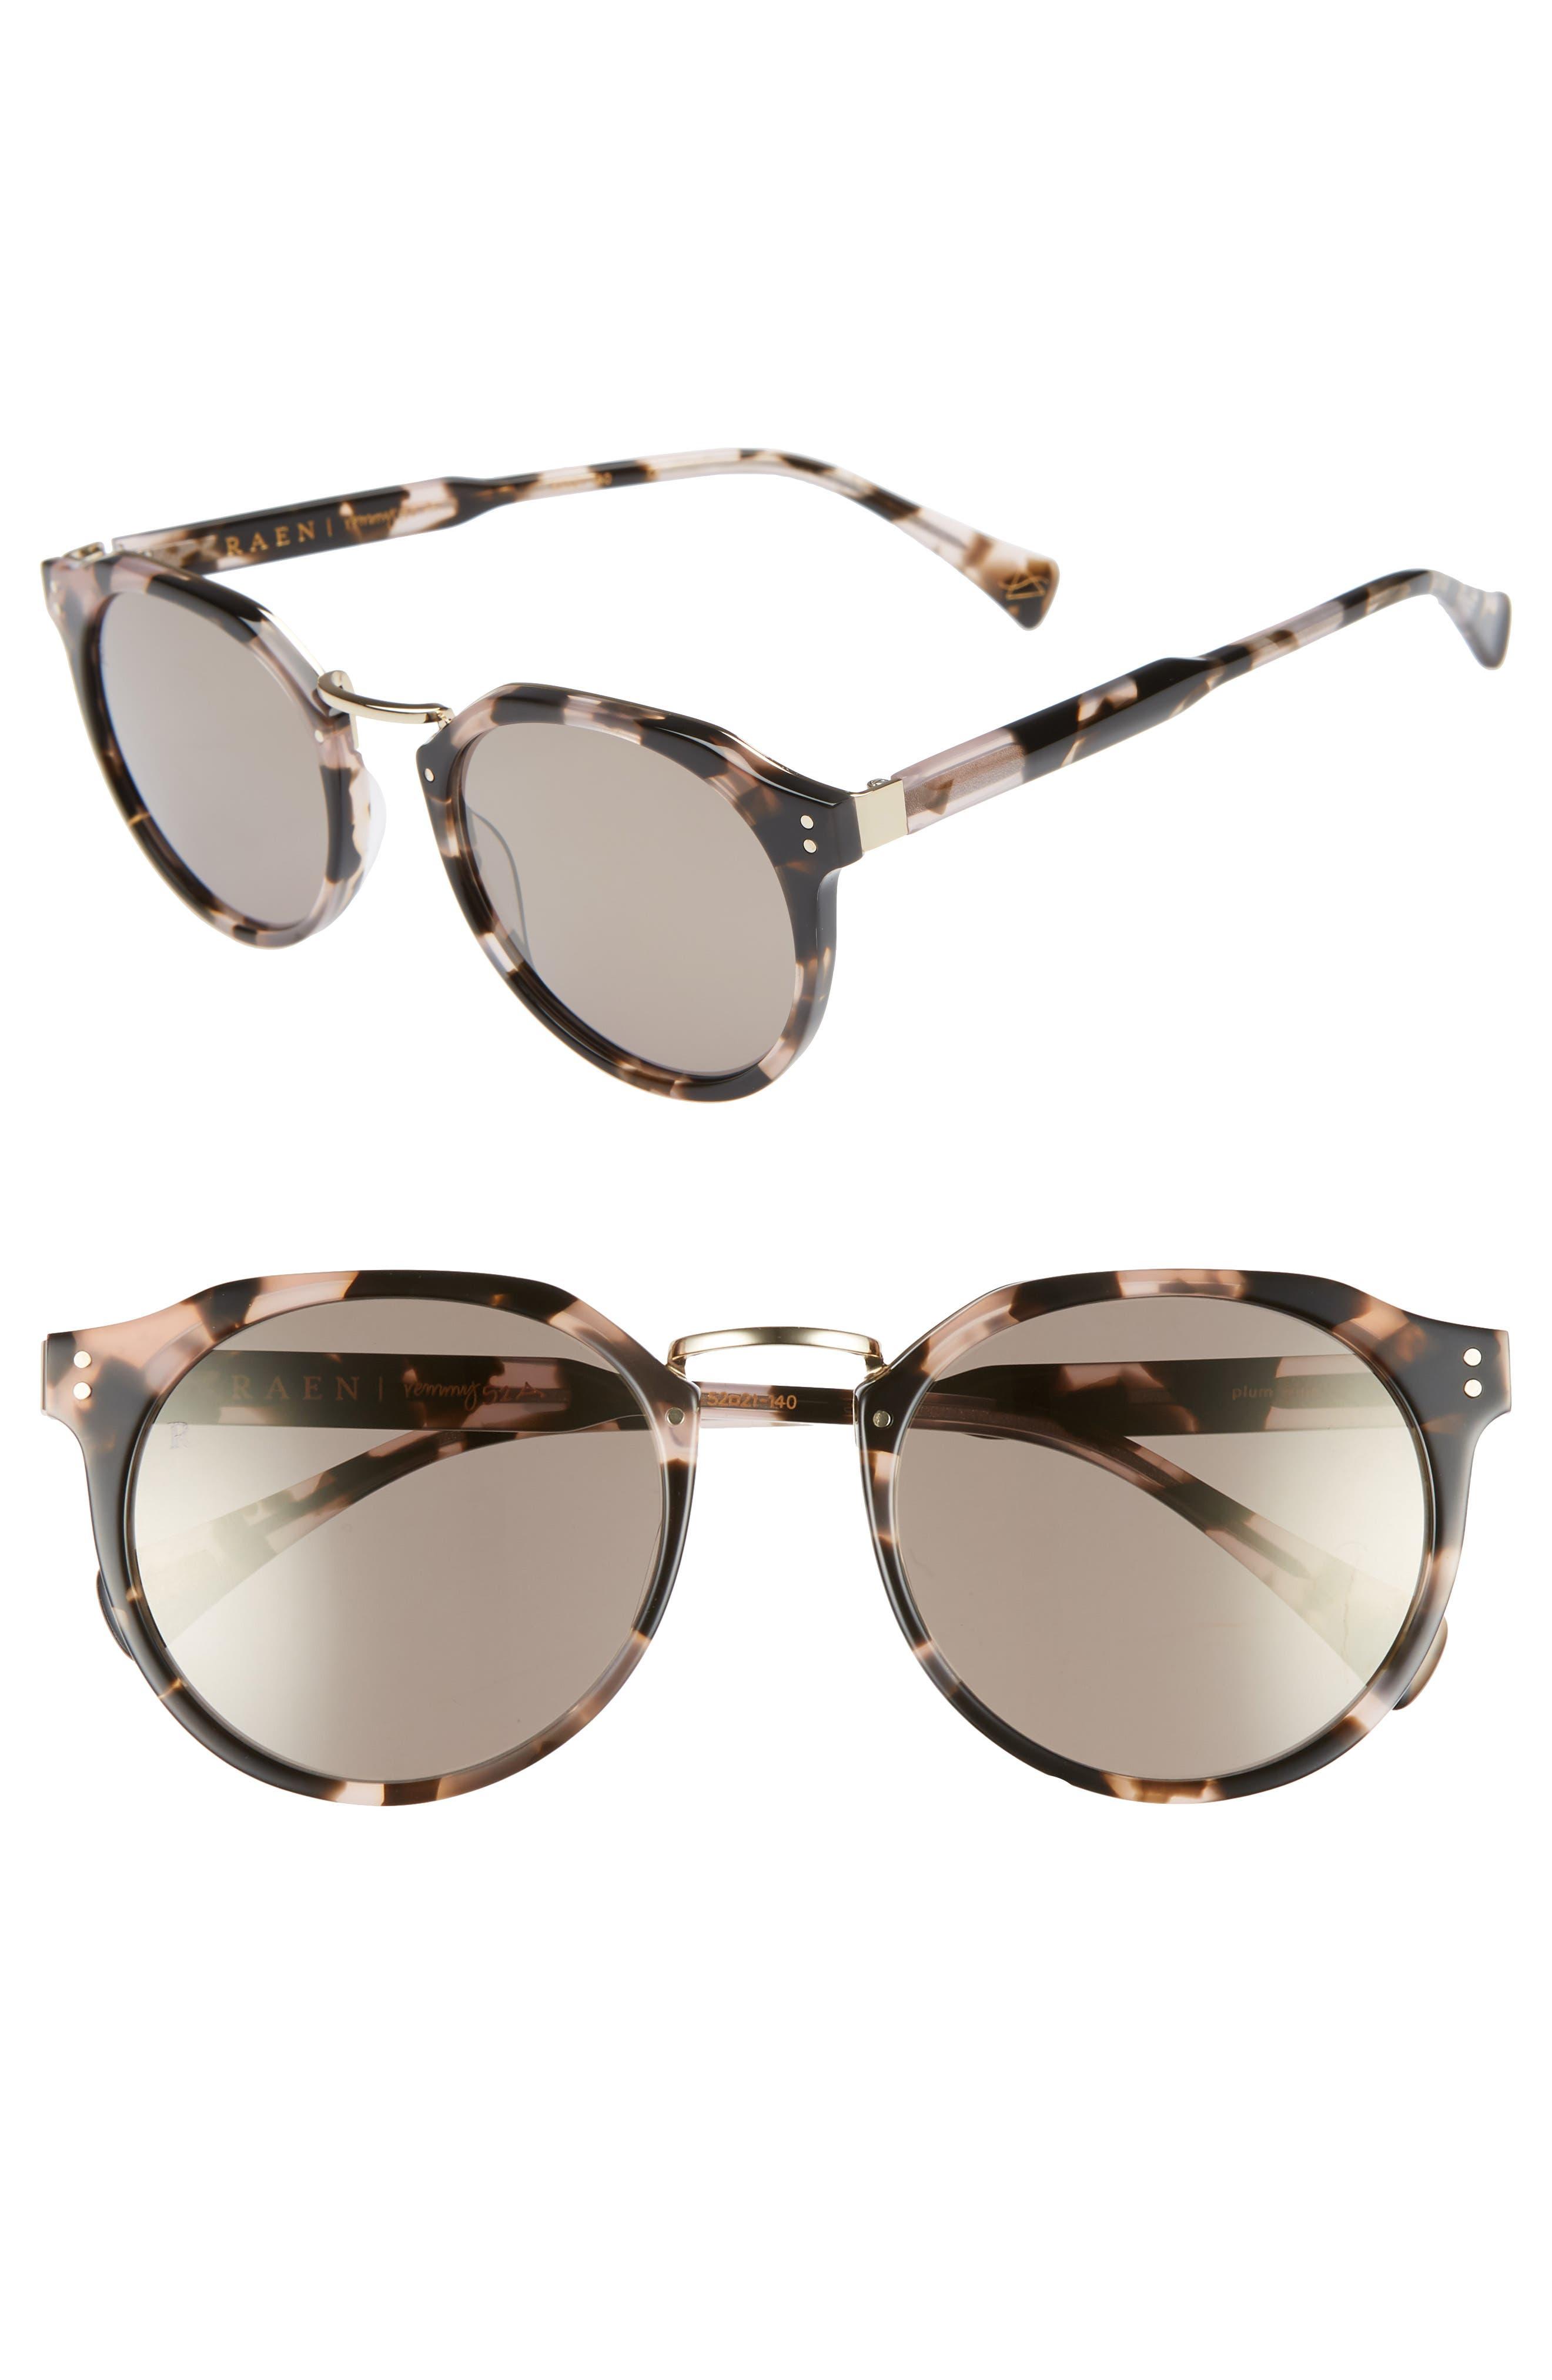 Remmy 52mm Sunglasses,                         Main,                         color, PLUM WINE